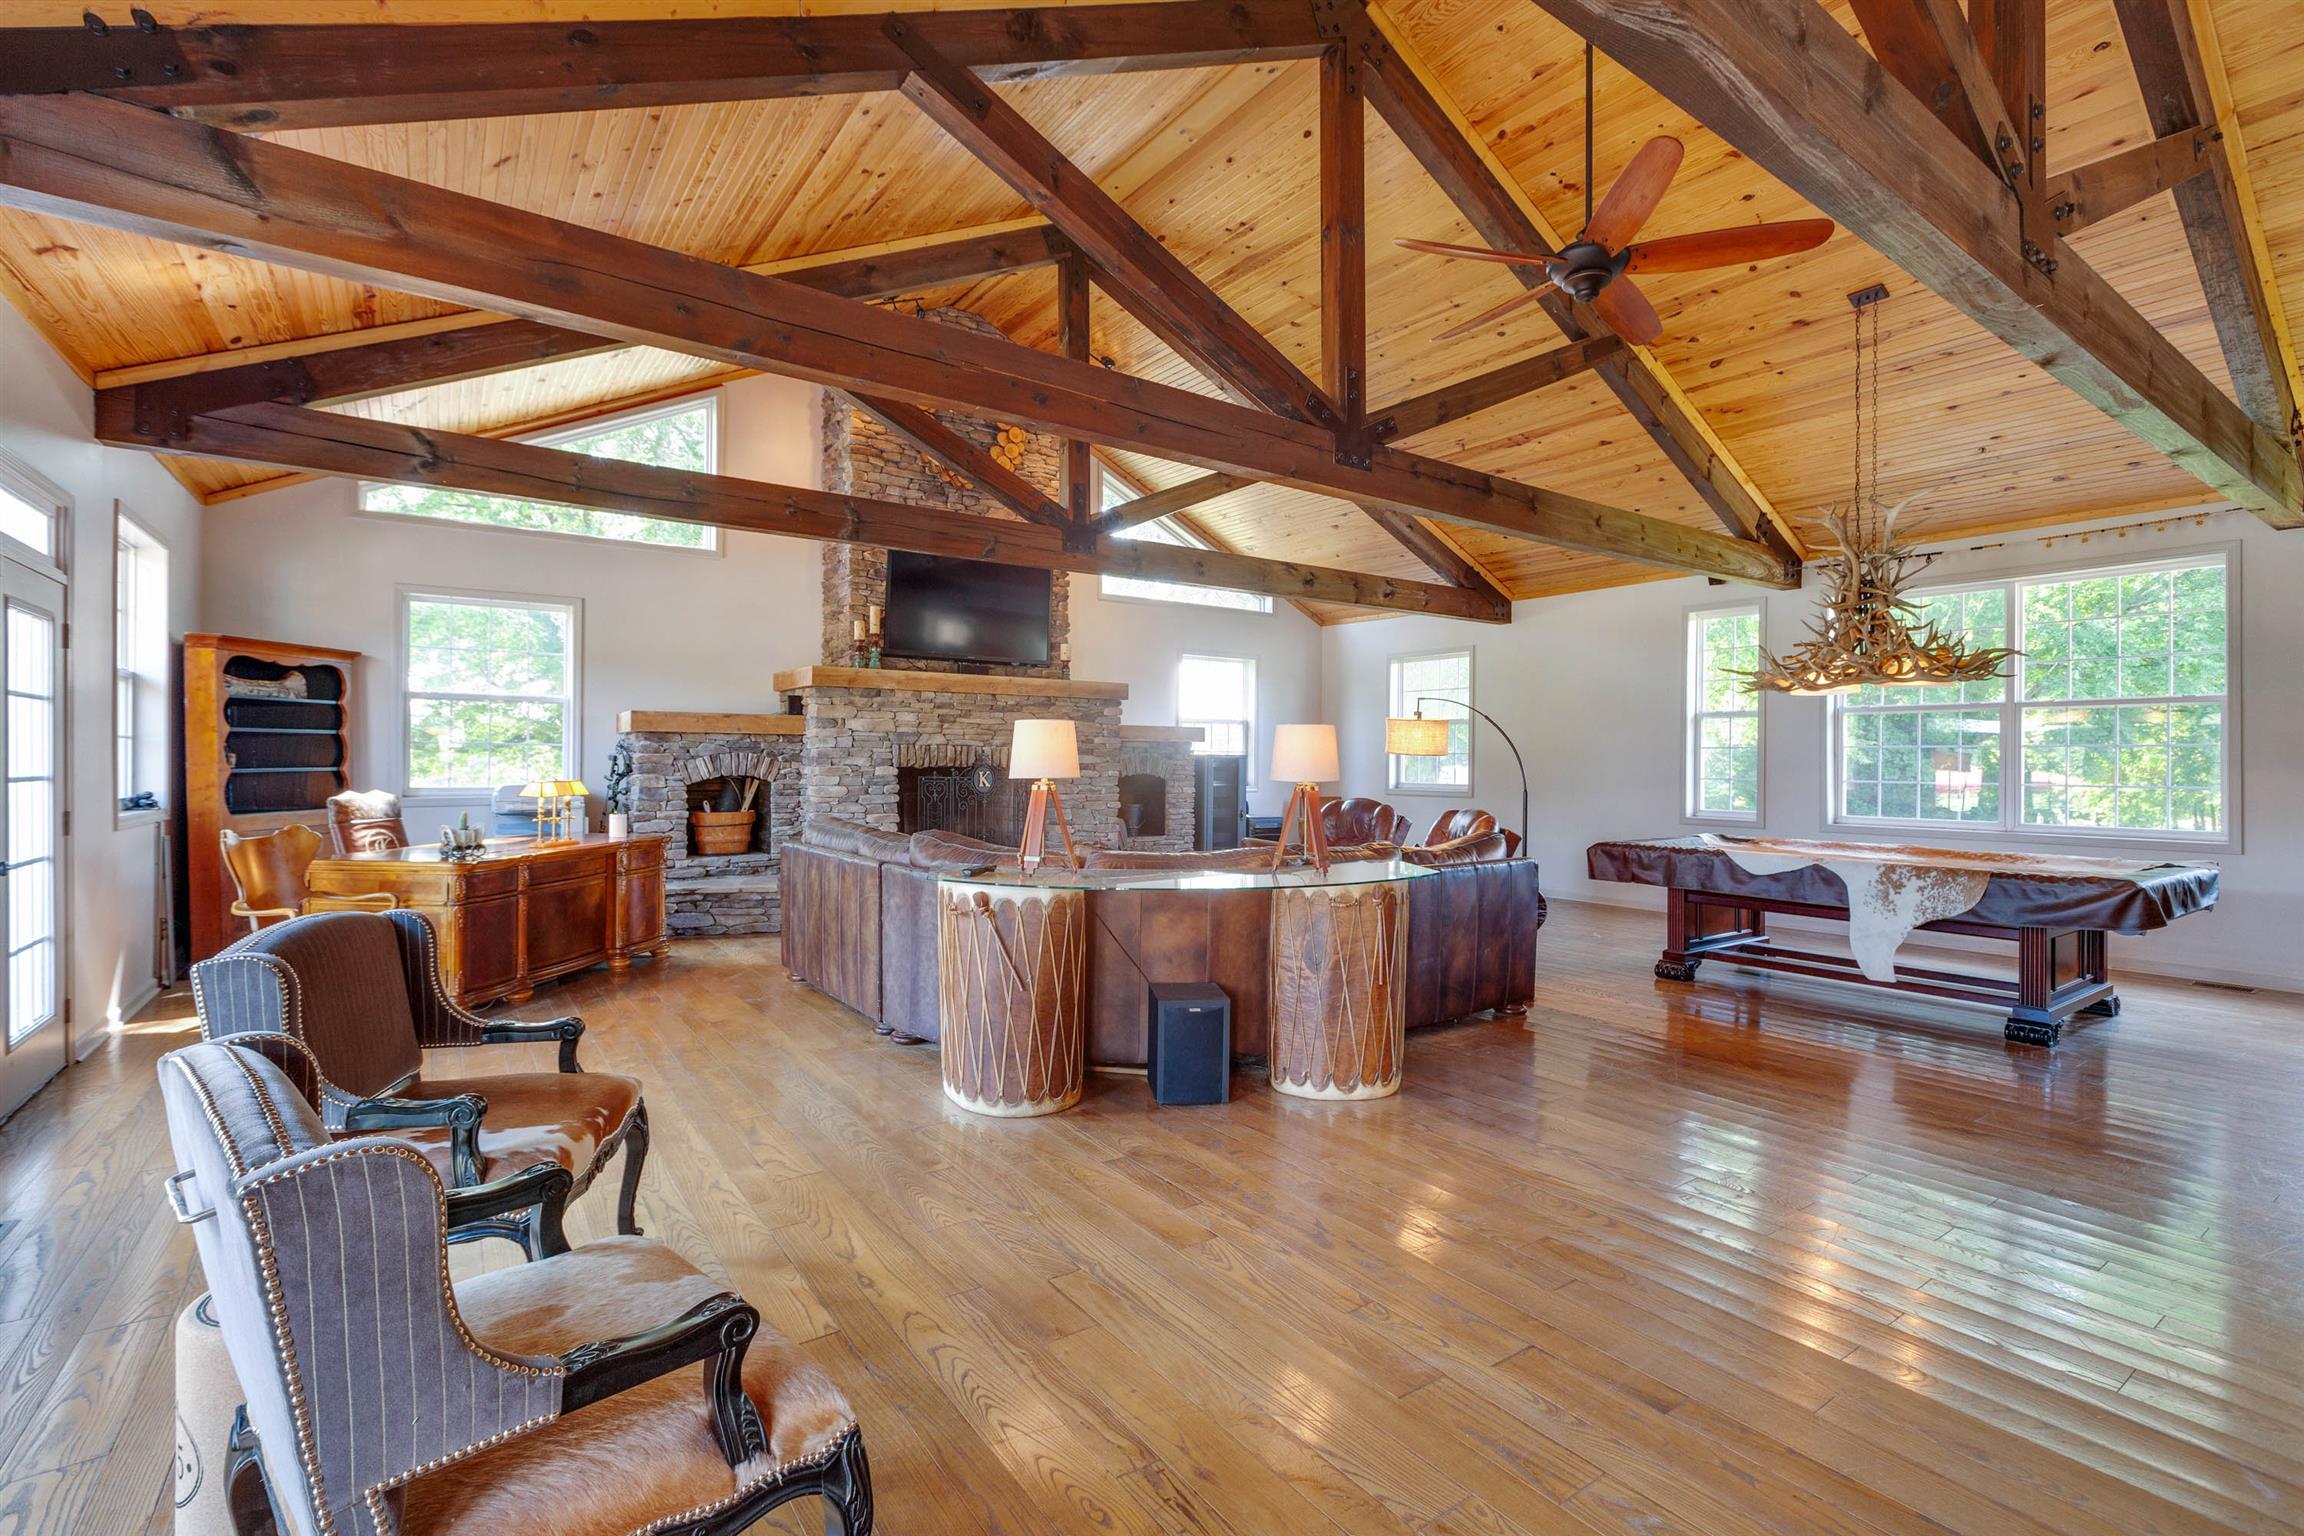 2534 Golden Pond Ln, Spring Hill, TN 37174 - Spring Hill, TN real estate listing